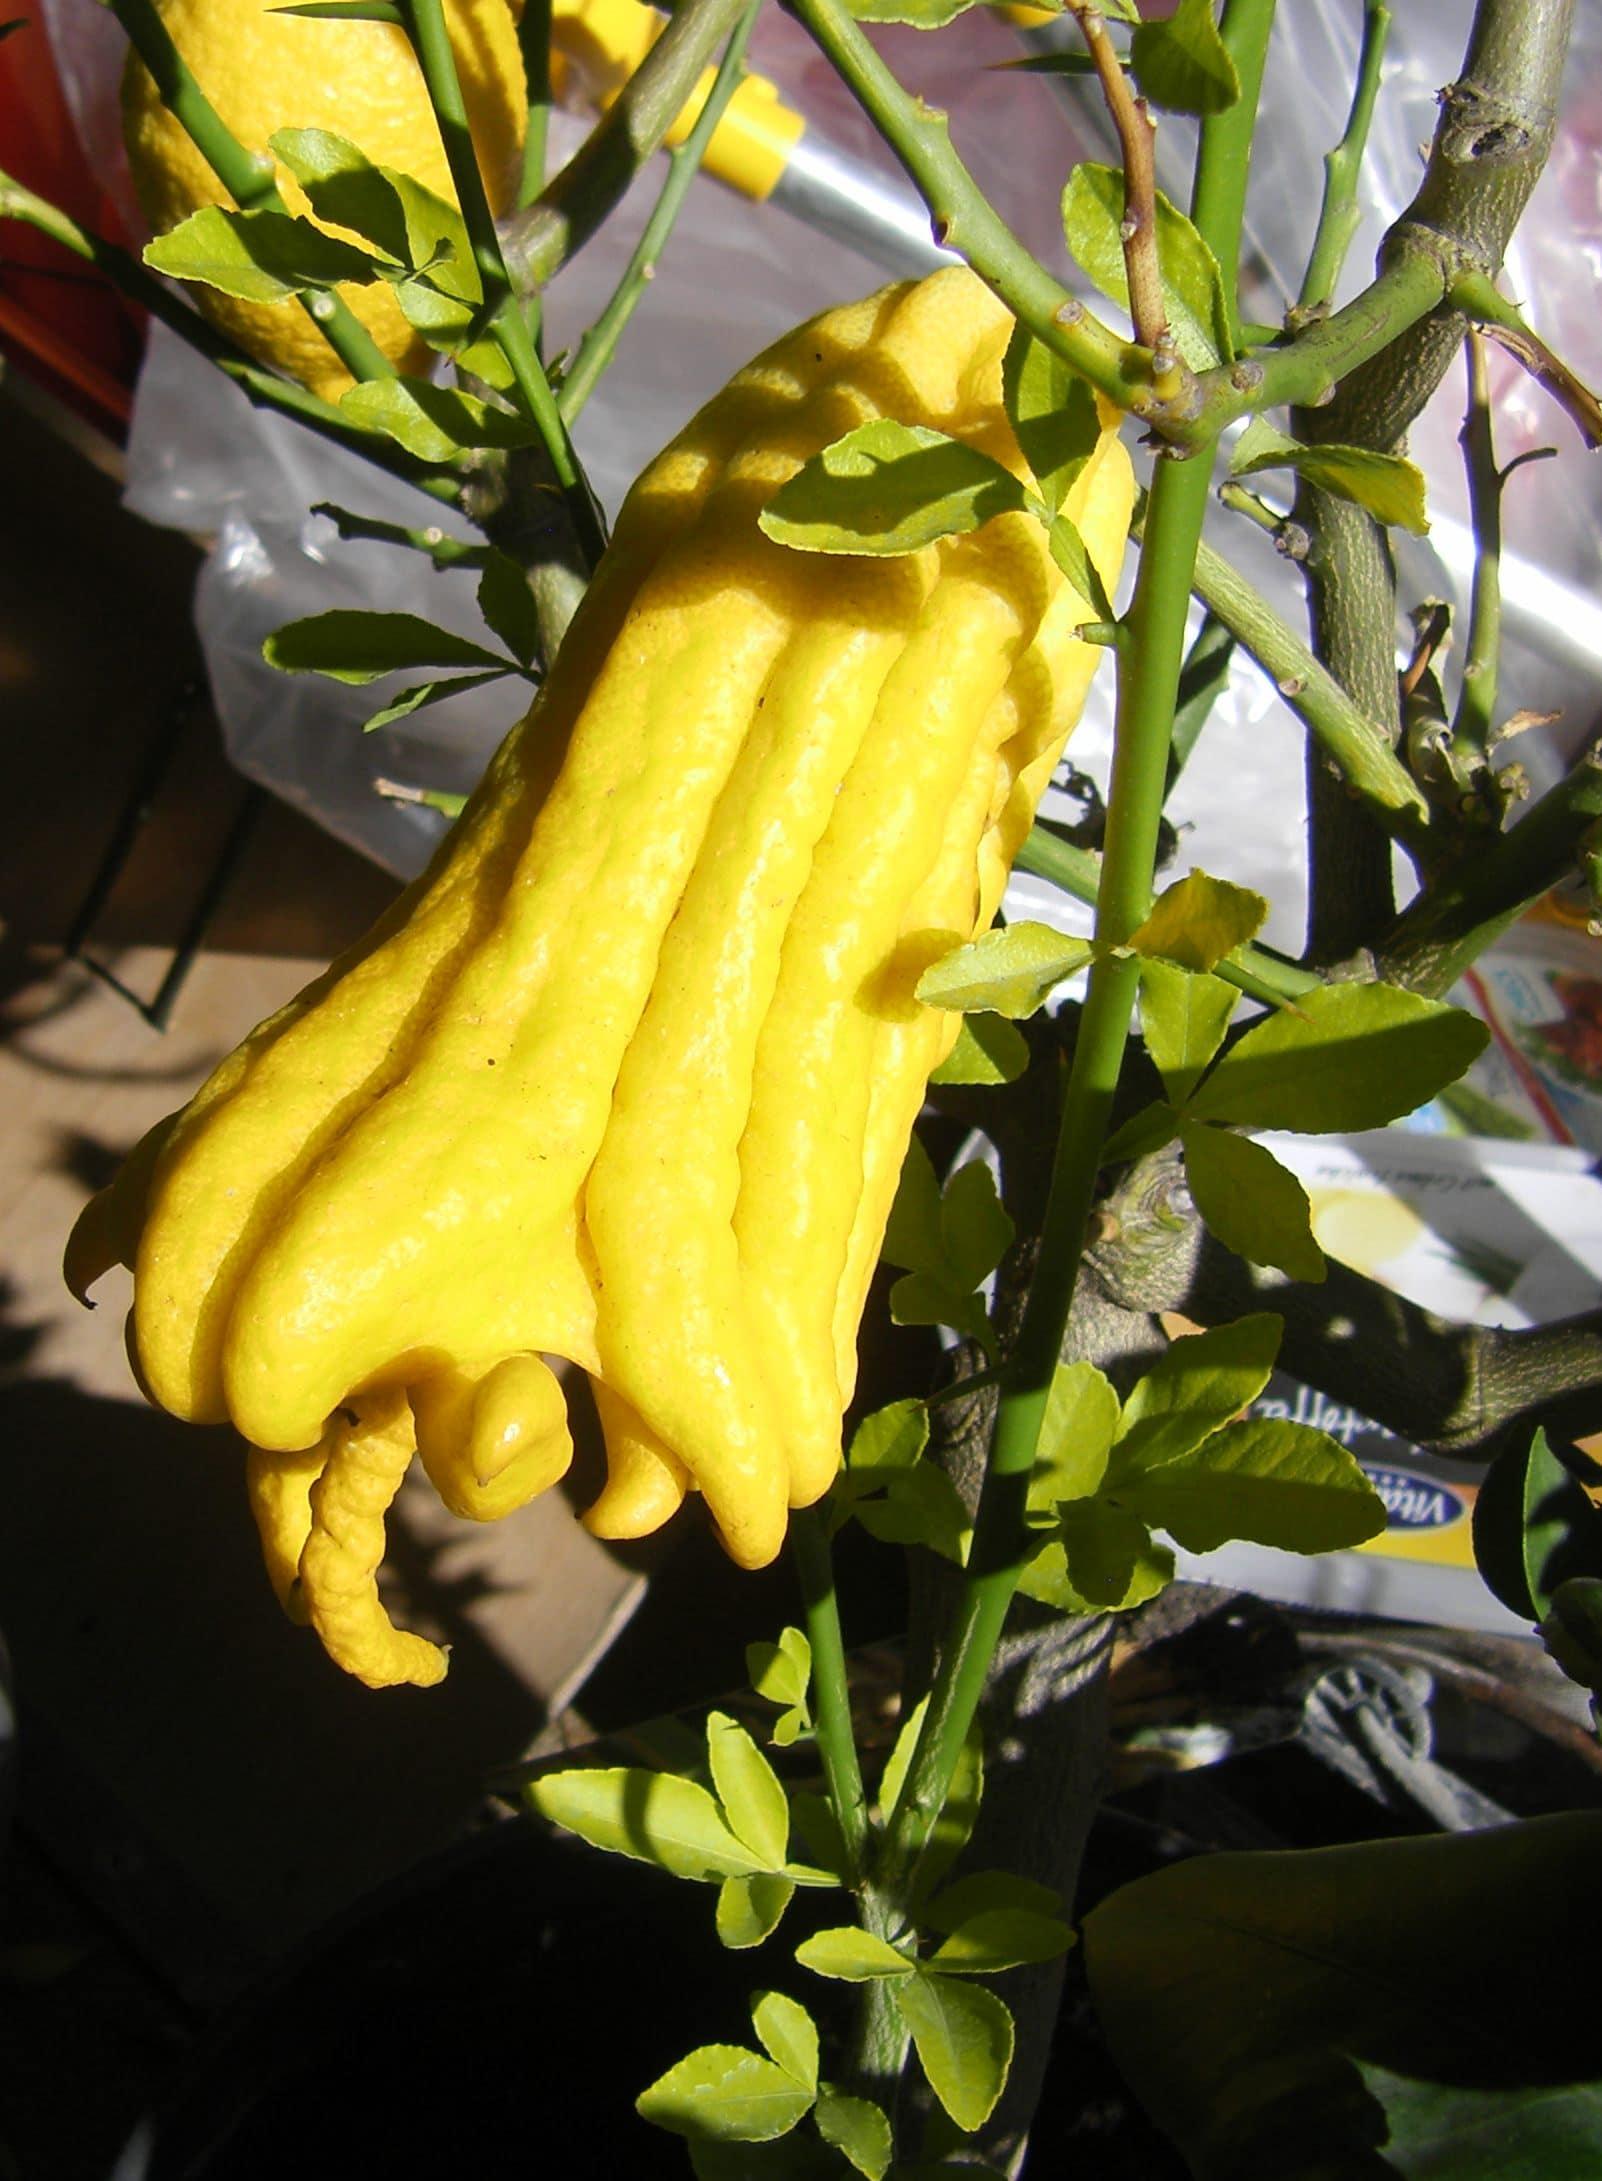 Buddhas Hand - Citrus medica